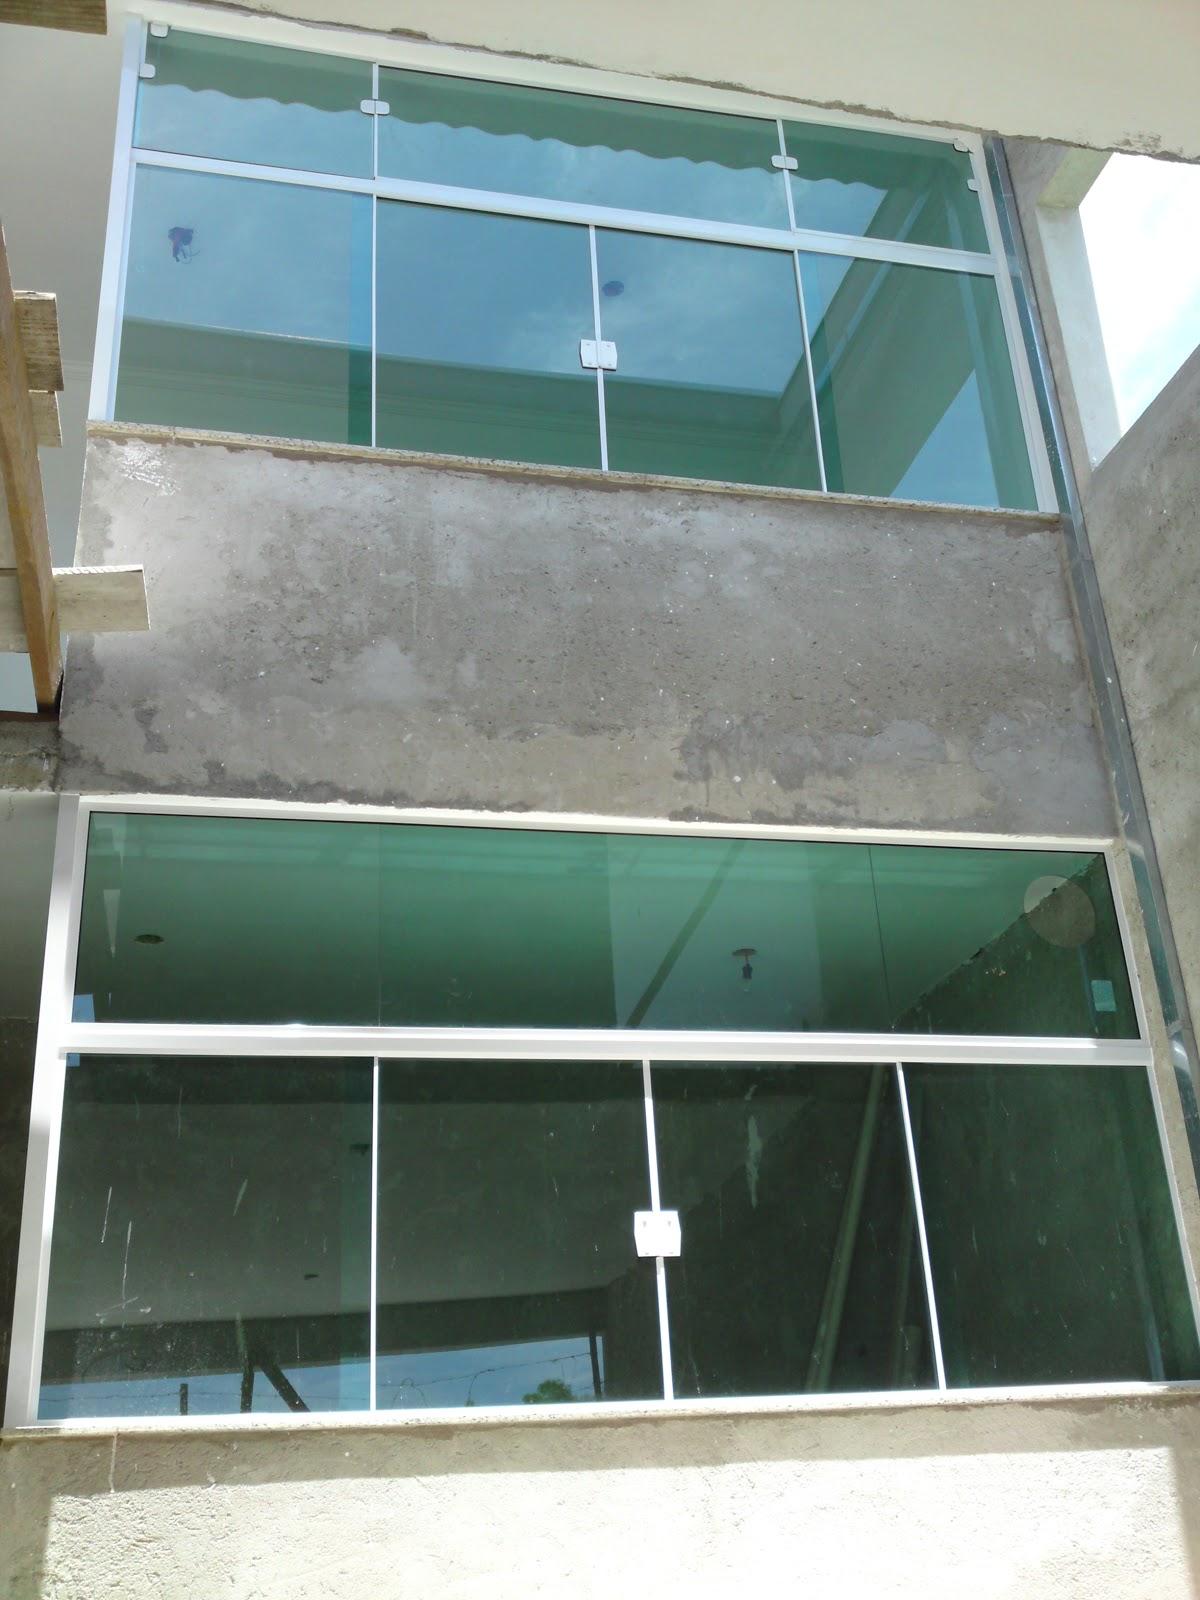 #437388 Vidraçaria Cinderela: Janelas em vidro temperado verde   kit branco 350 Janelas De Vidro Temperado Preço Rj